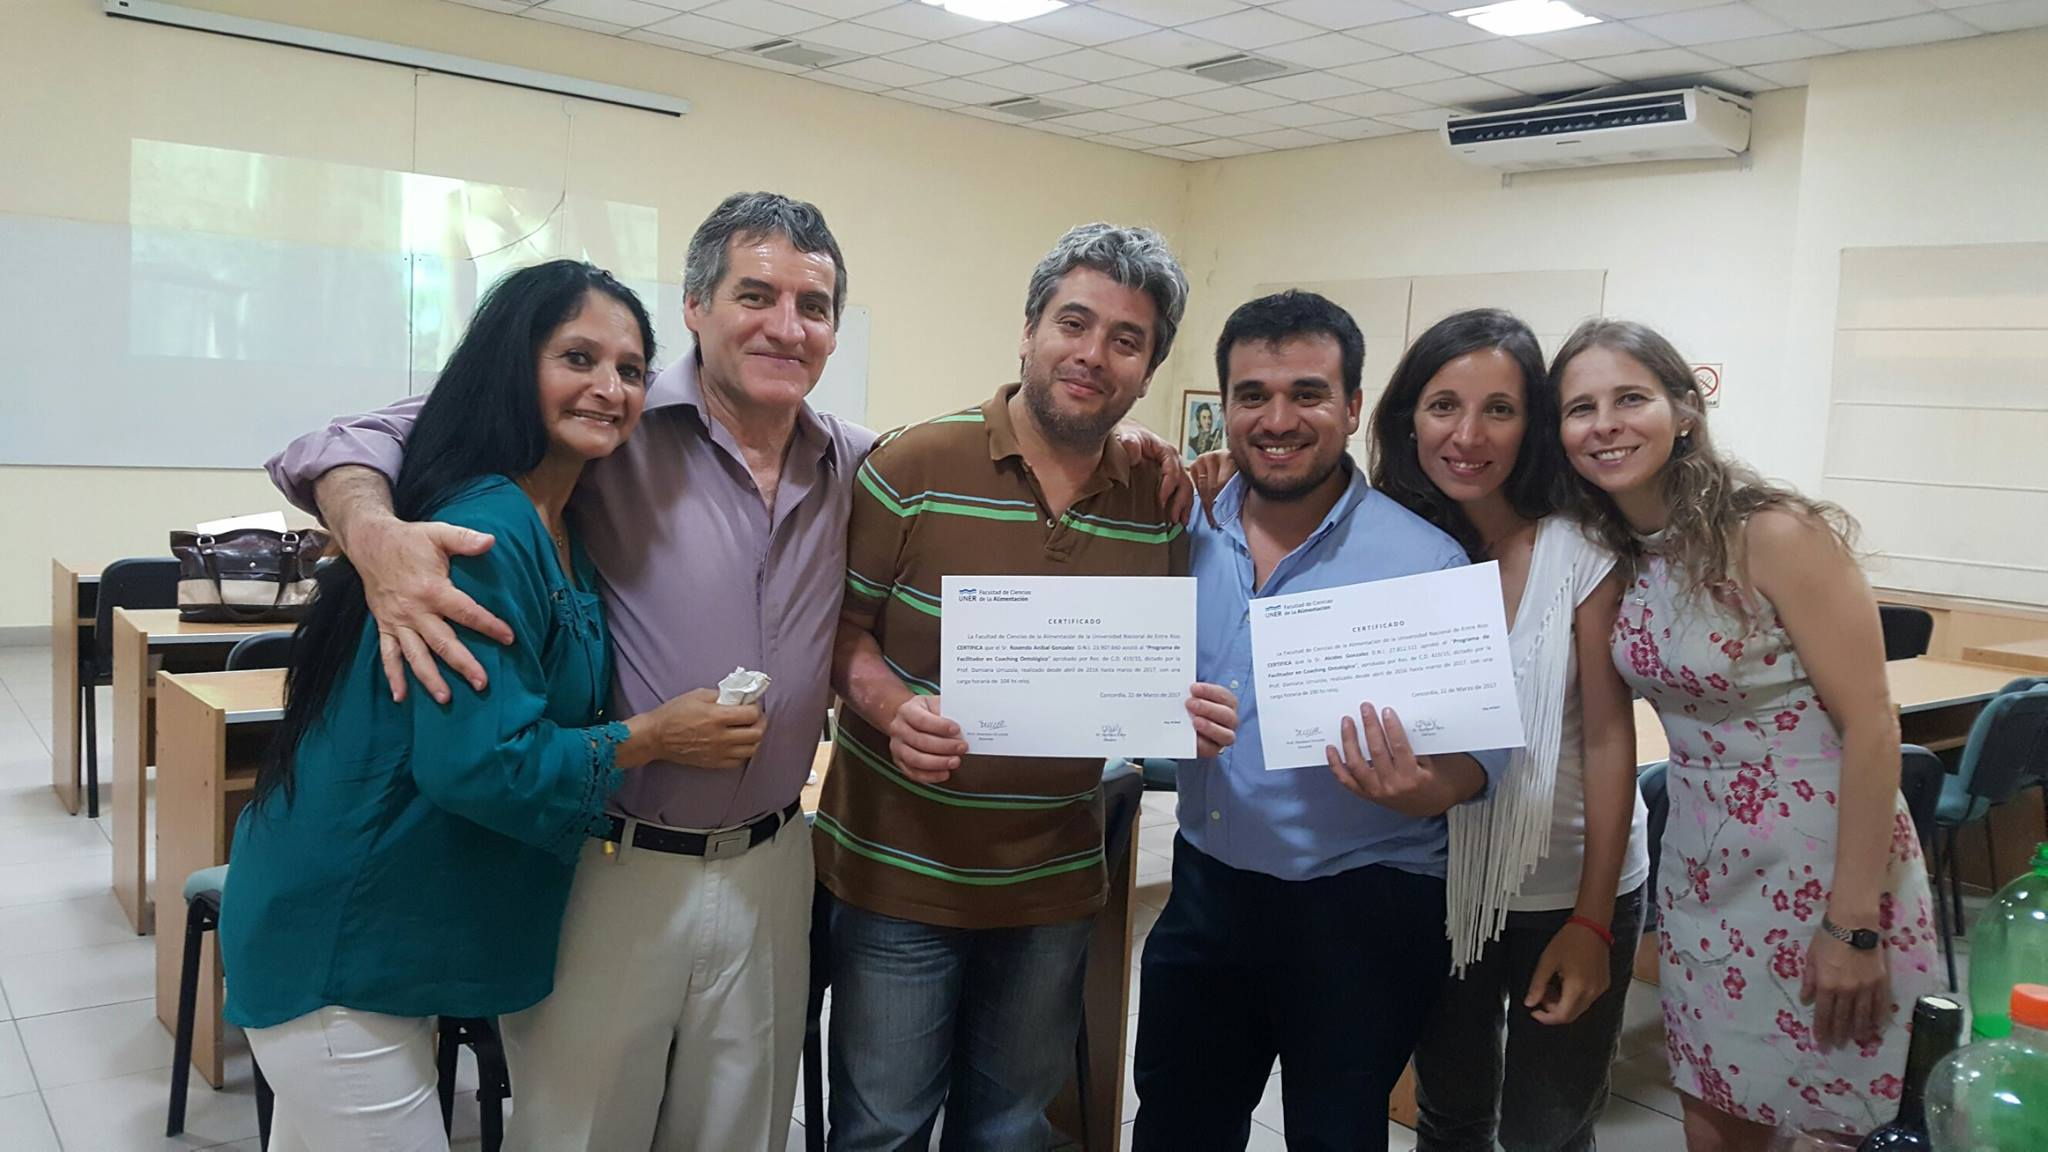 Entrega de Certificados del Curso de Facilitador en Coaching Ontológico 2da Edición. UNER.